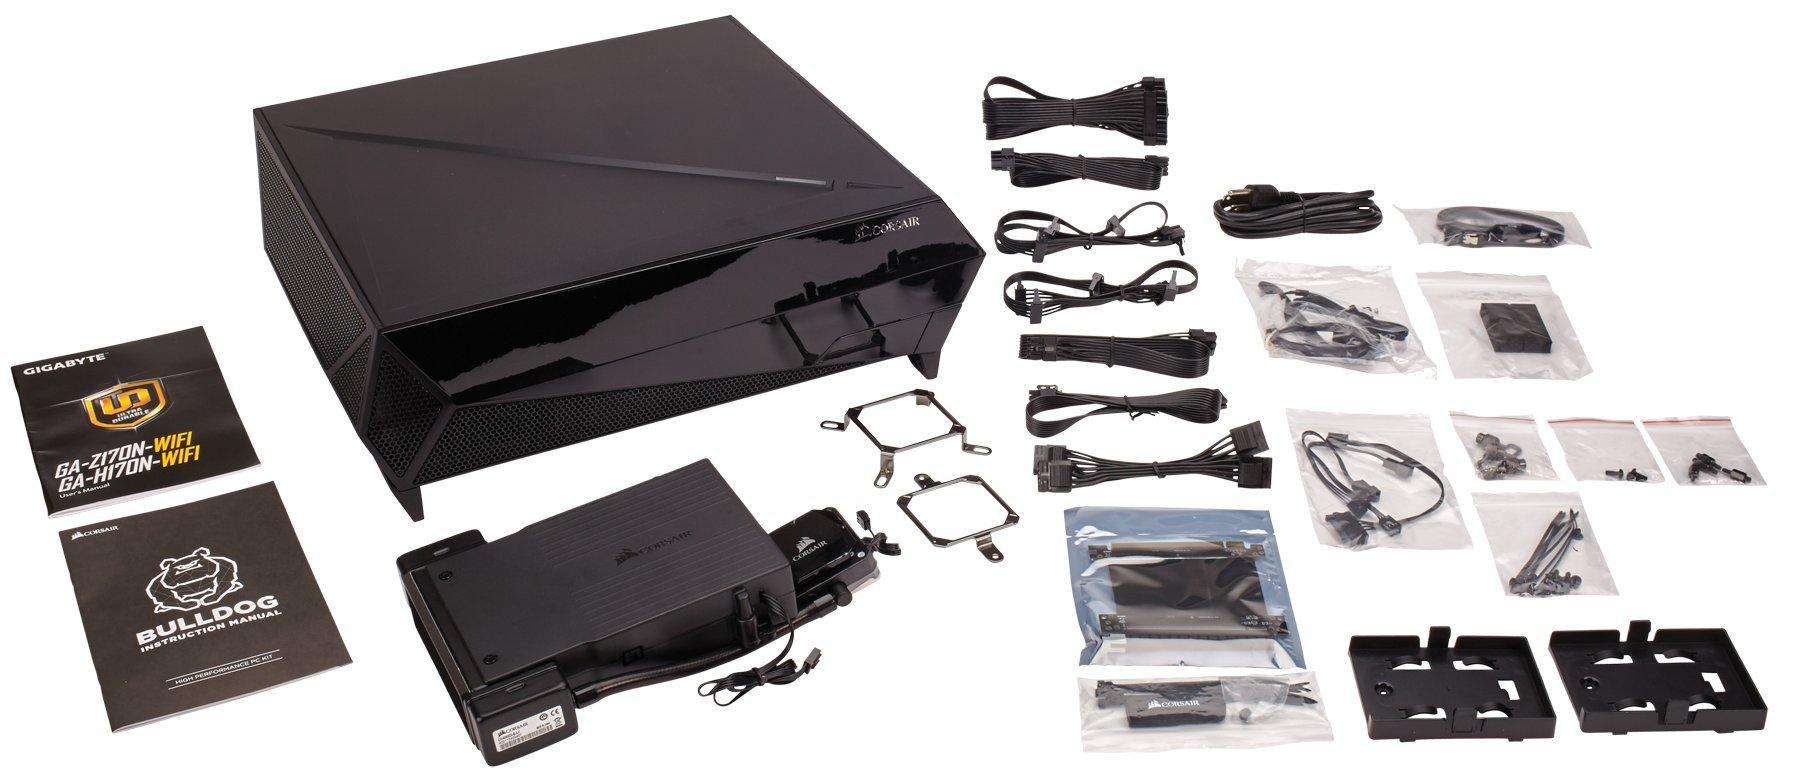 Corsair Bulldog High Performance PC Kit Computer Barebones Systems CS-9000001-NA by Corsair (Image #6)